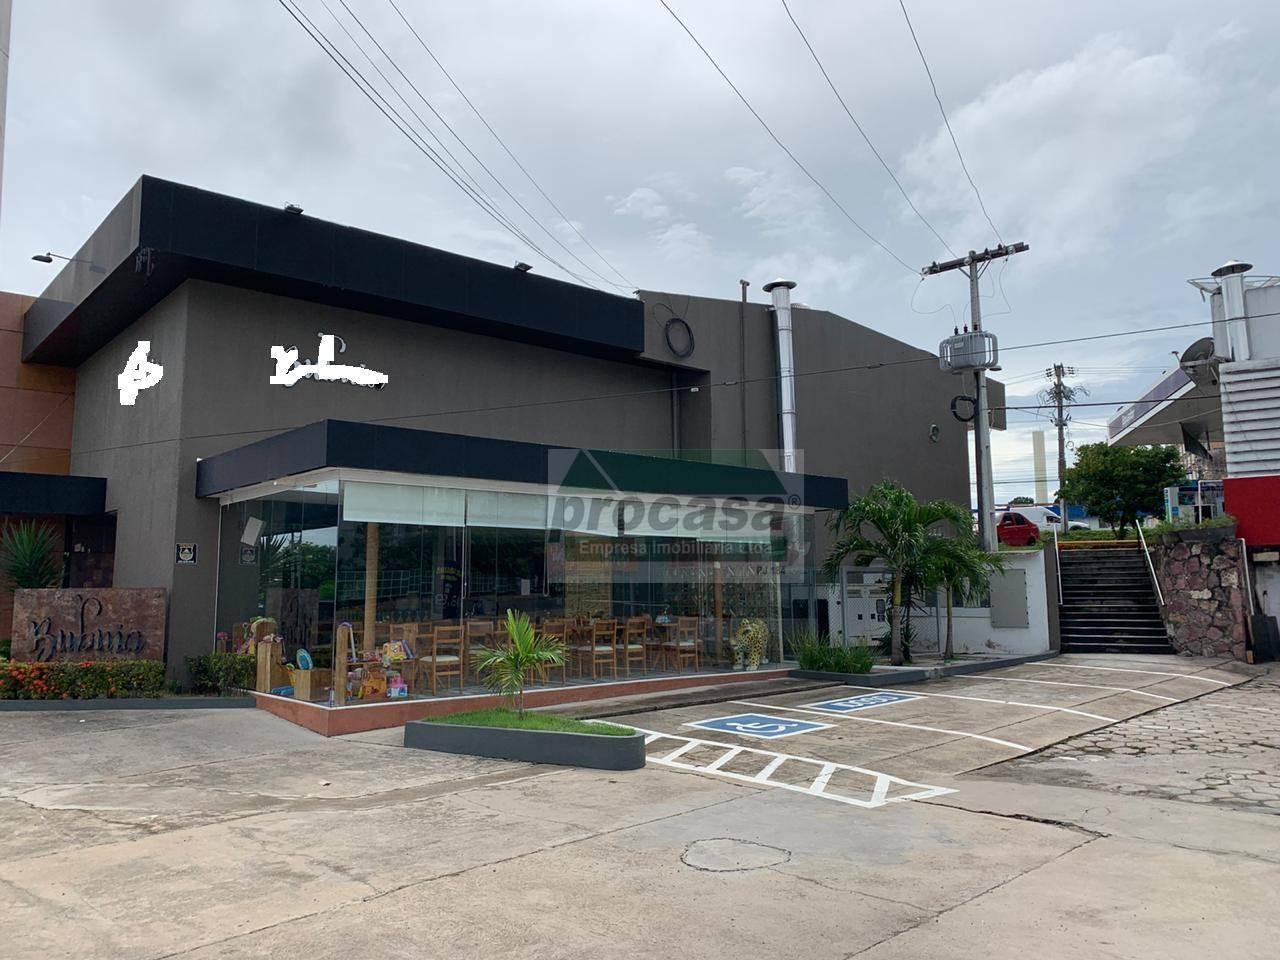 Loja para alugar, 340 m² por R$ 12.000/mês - Distrito Industrial I - Manaus/AM